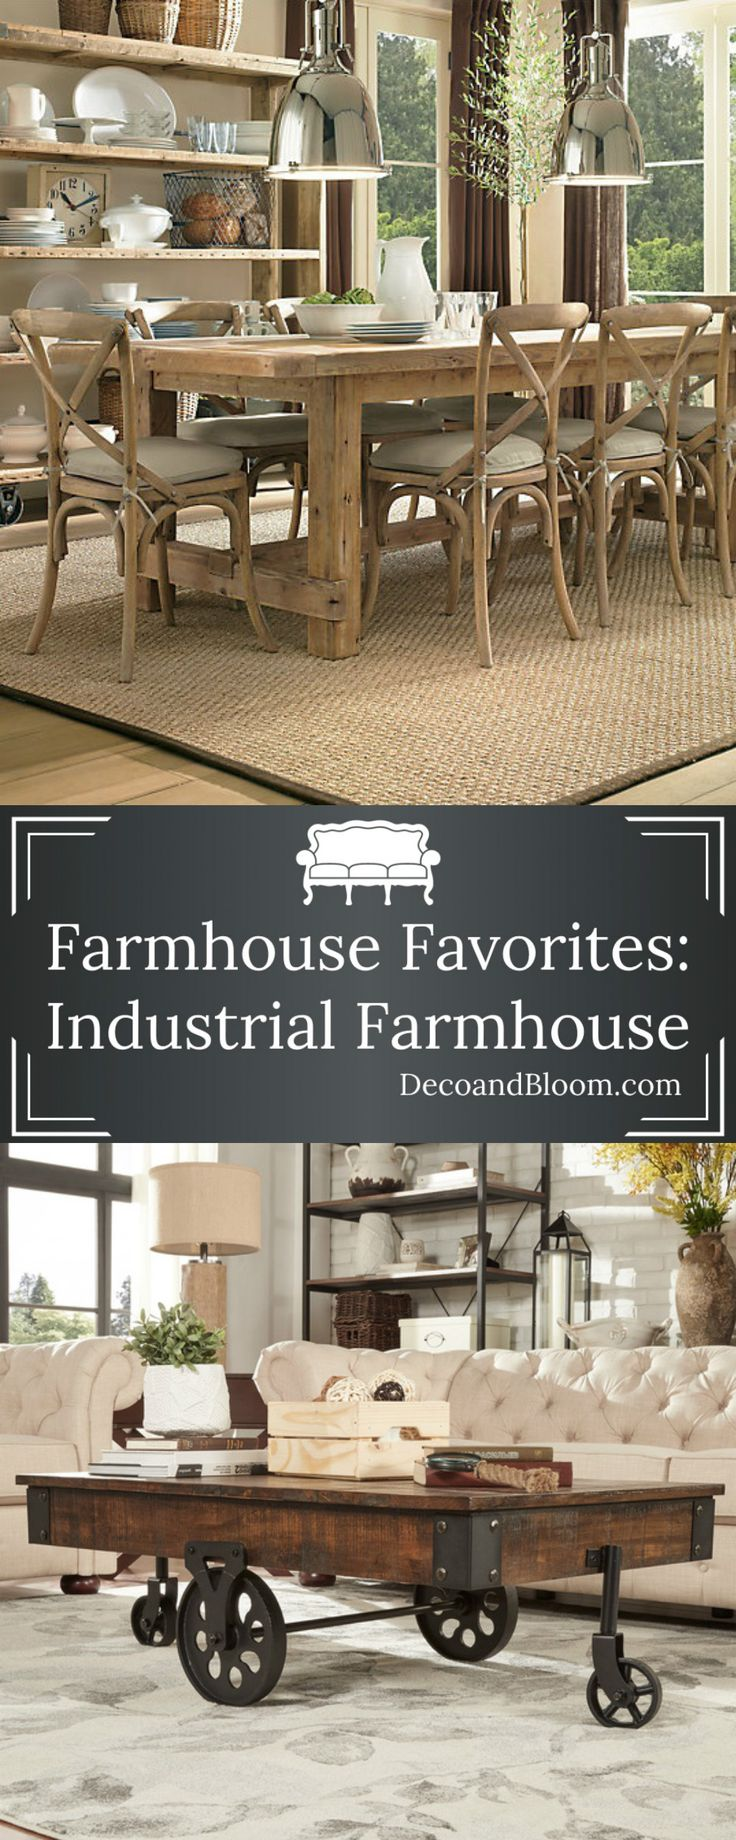 Industrial Home Decor Living Room: Best 25+ Industrial Farmhouse Decor Ideas On Pinterest